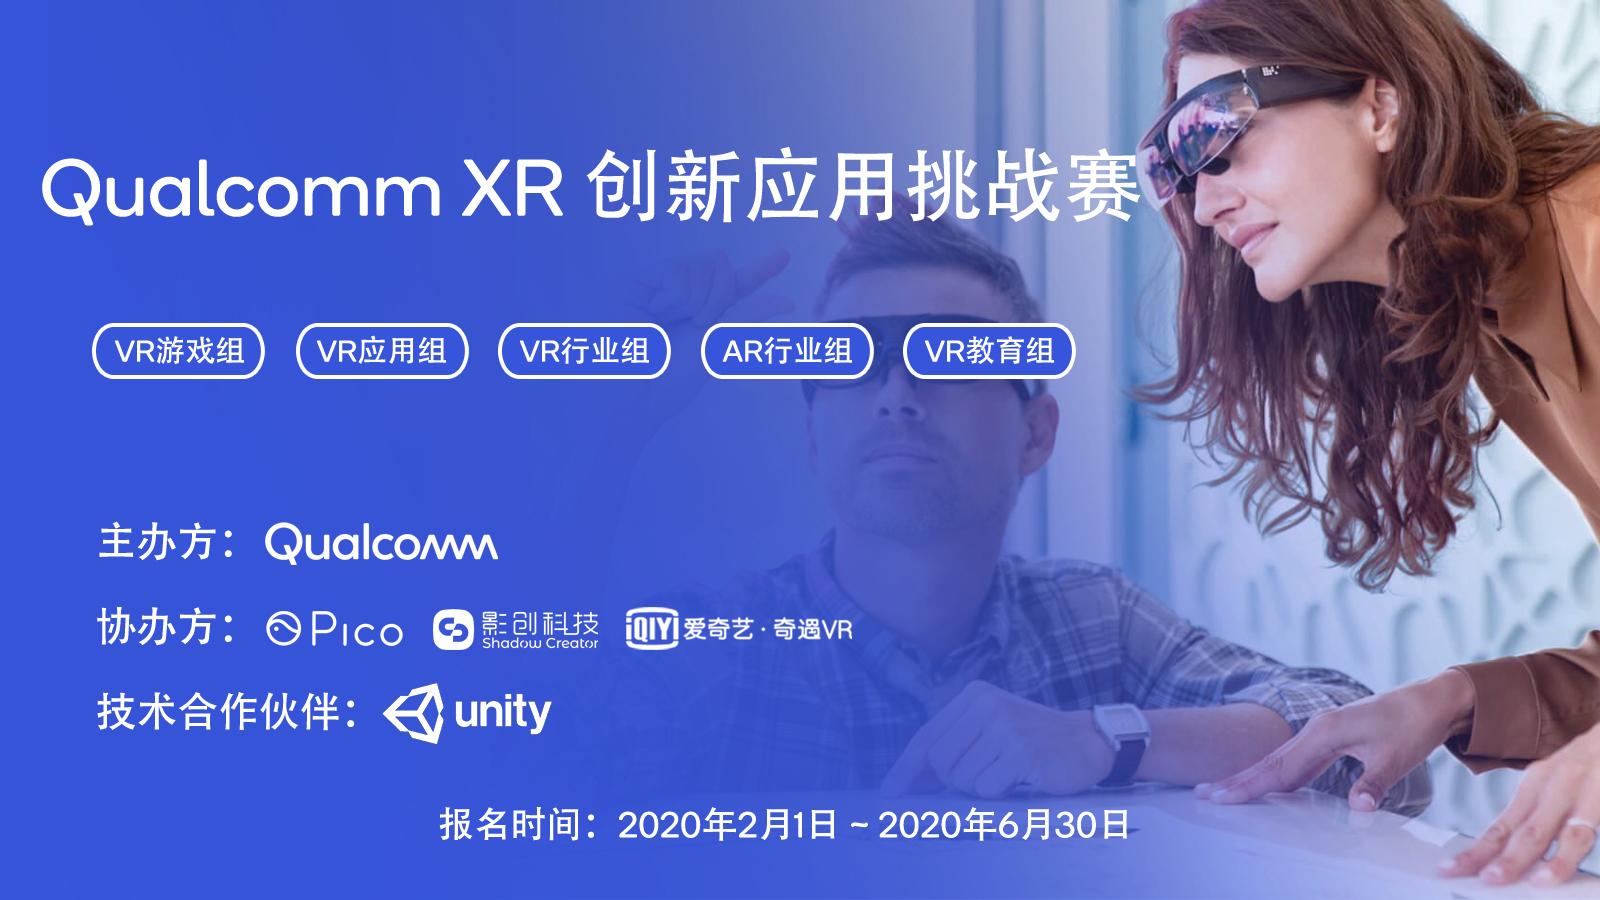 2020 Qualcomm XR 创新应用挑战赛正式启动